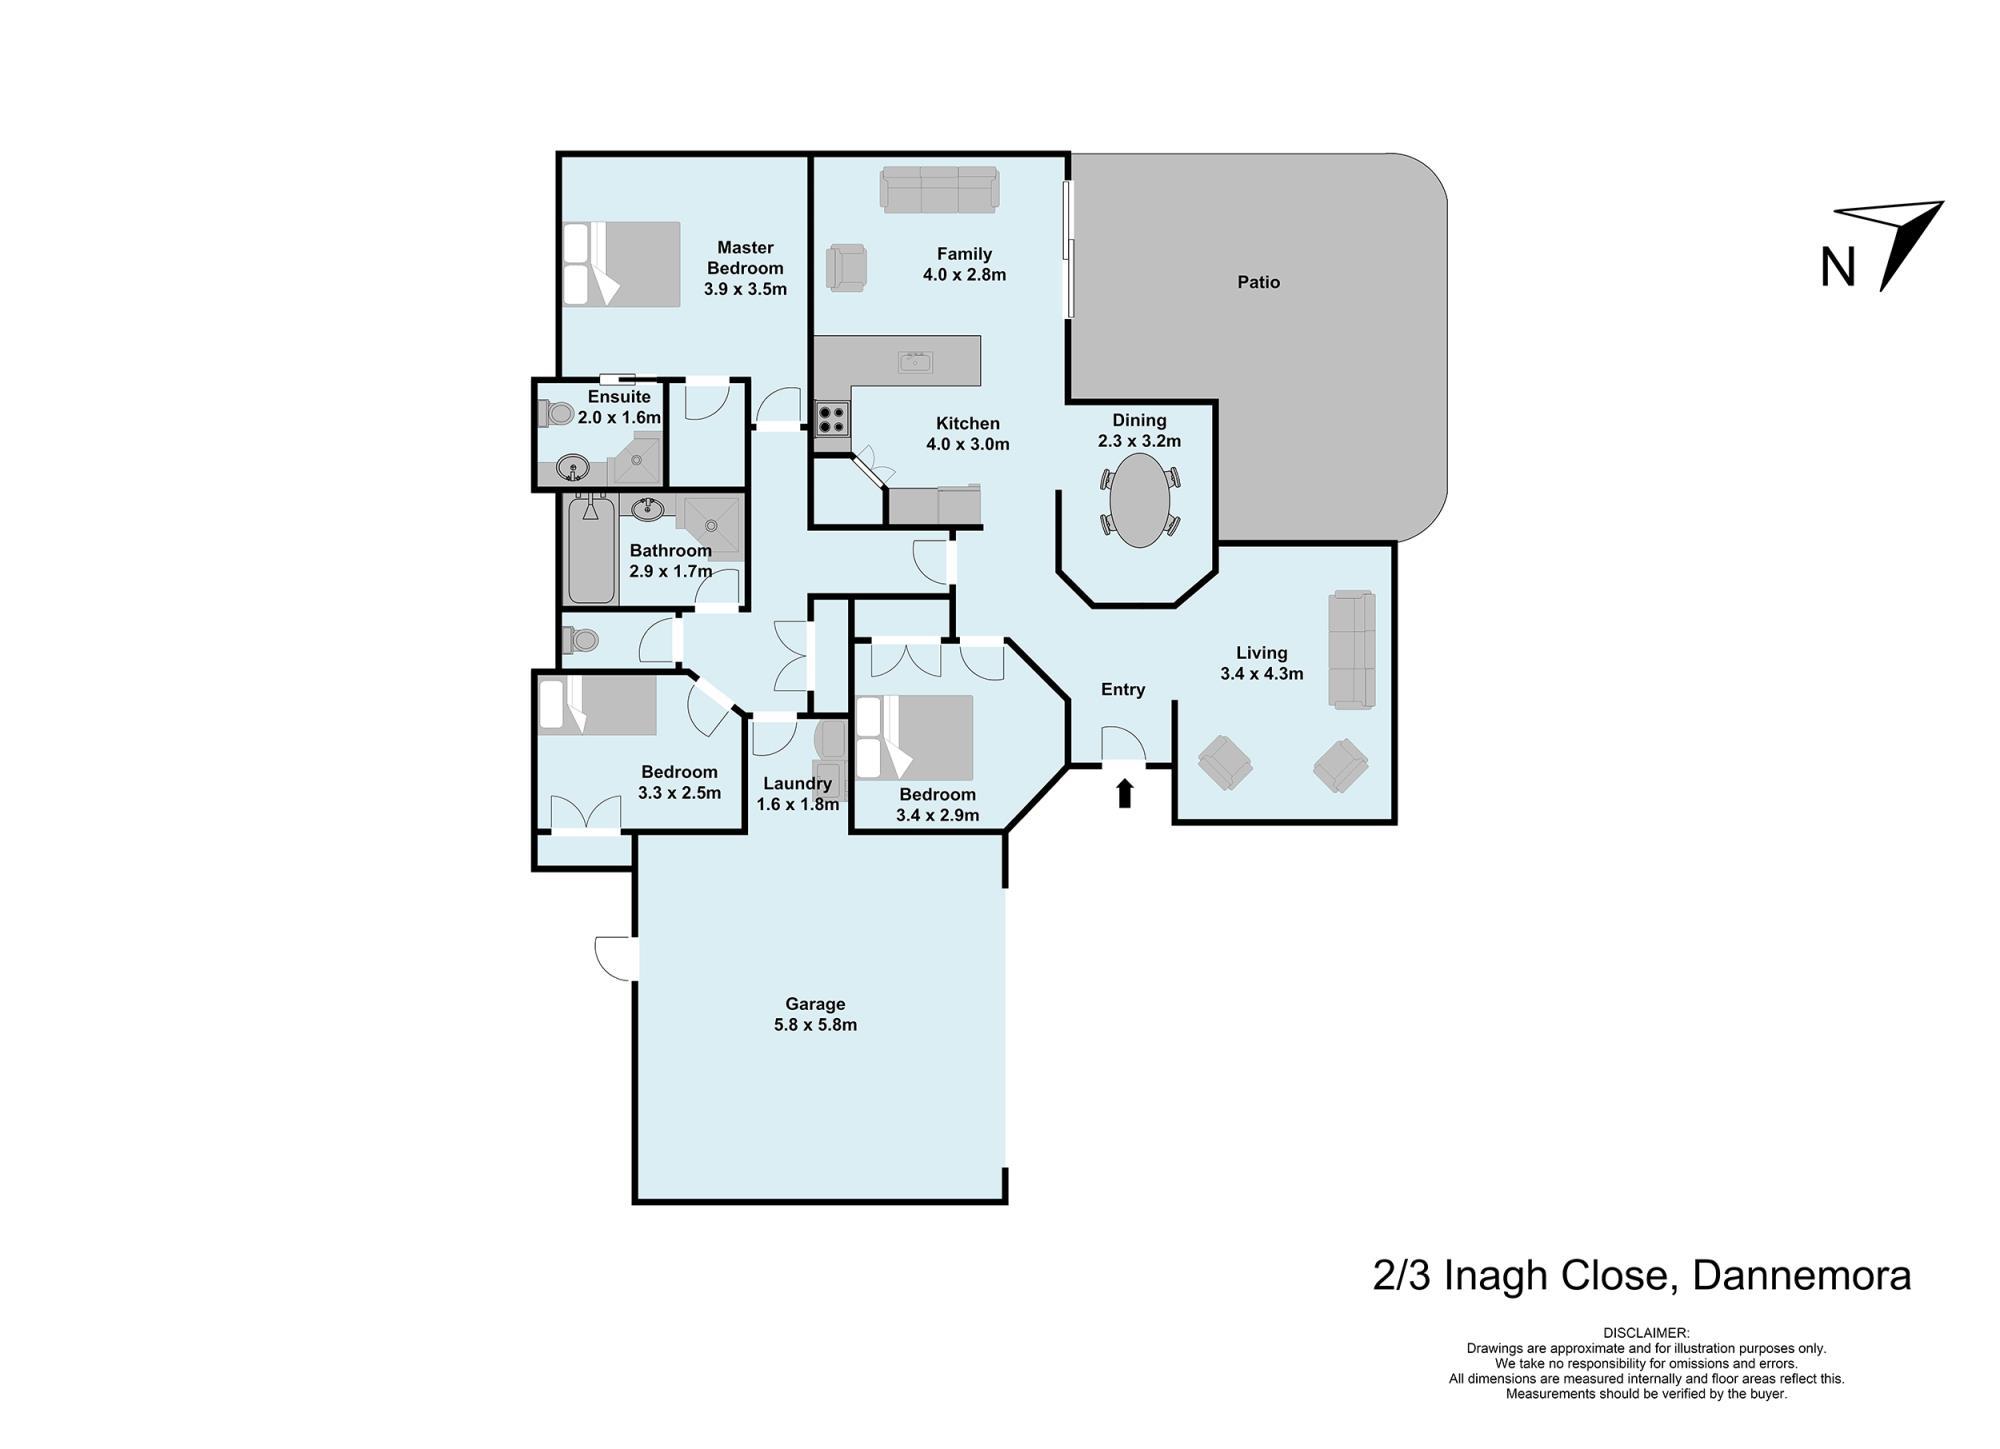 2/3 Inagh Close Dannemoraproperty floorplan image